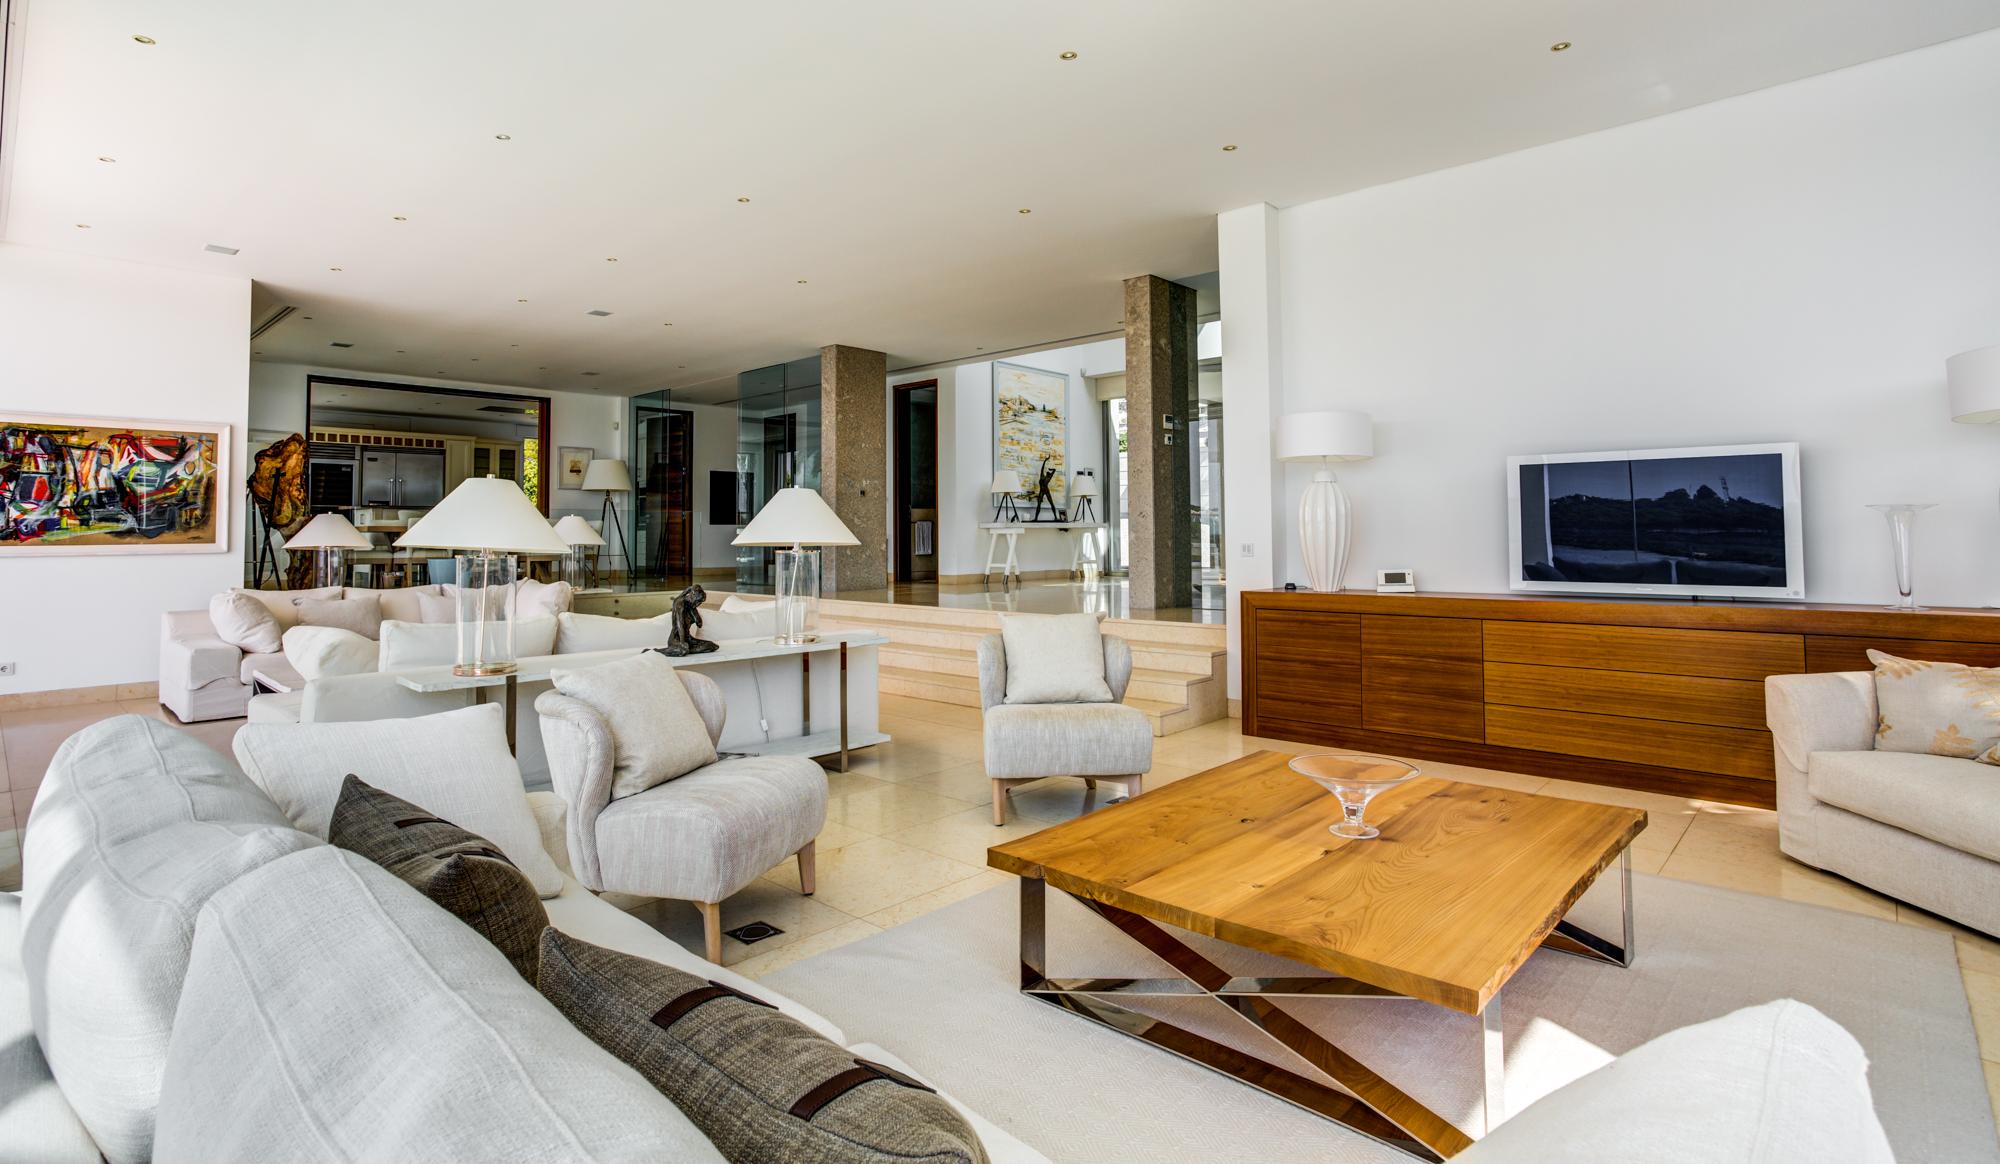 Villa Moon Sone, 5 bedroom prestige villa in Quinta do Lago, Algarve,lounge 2.jpg